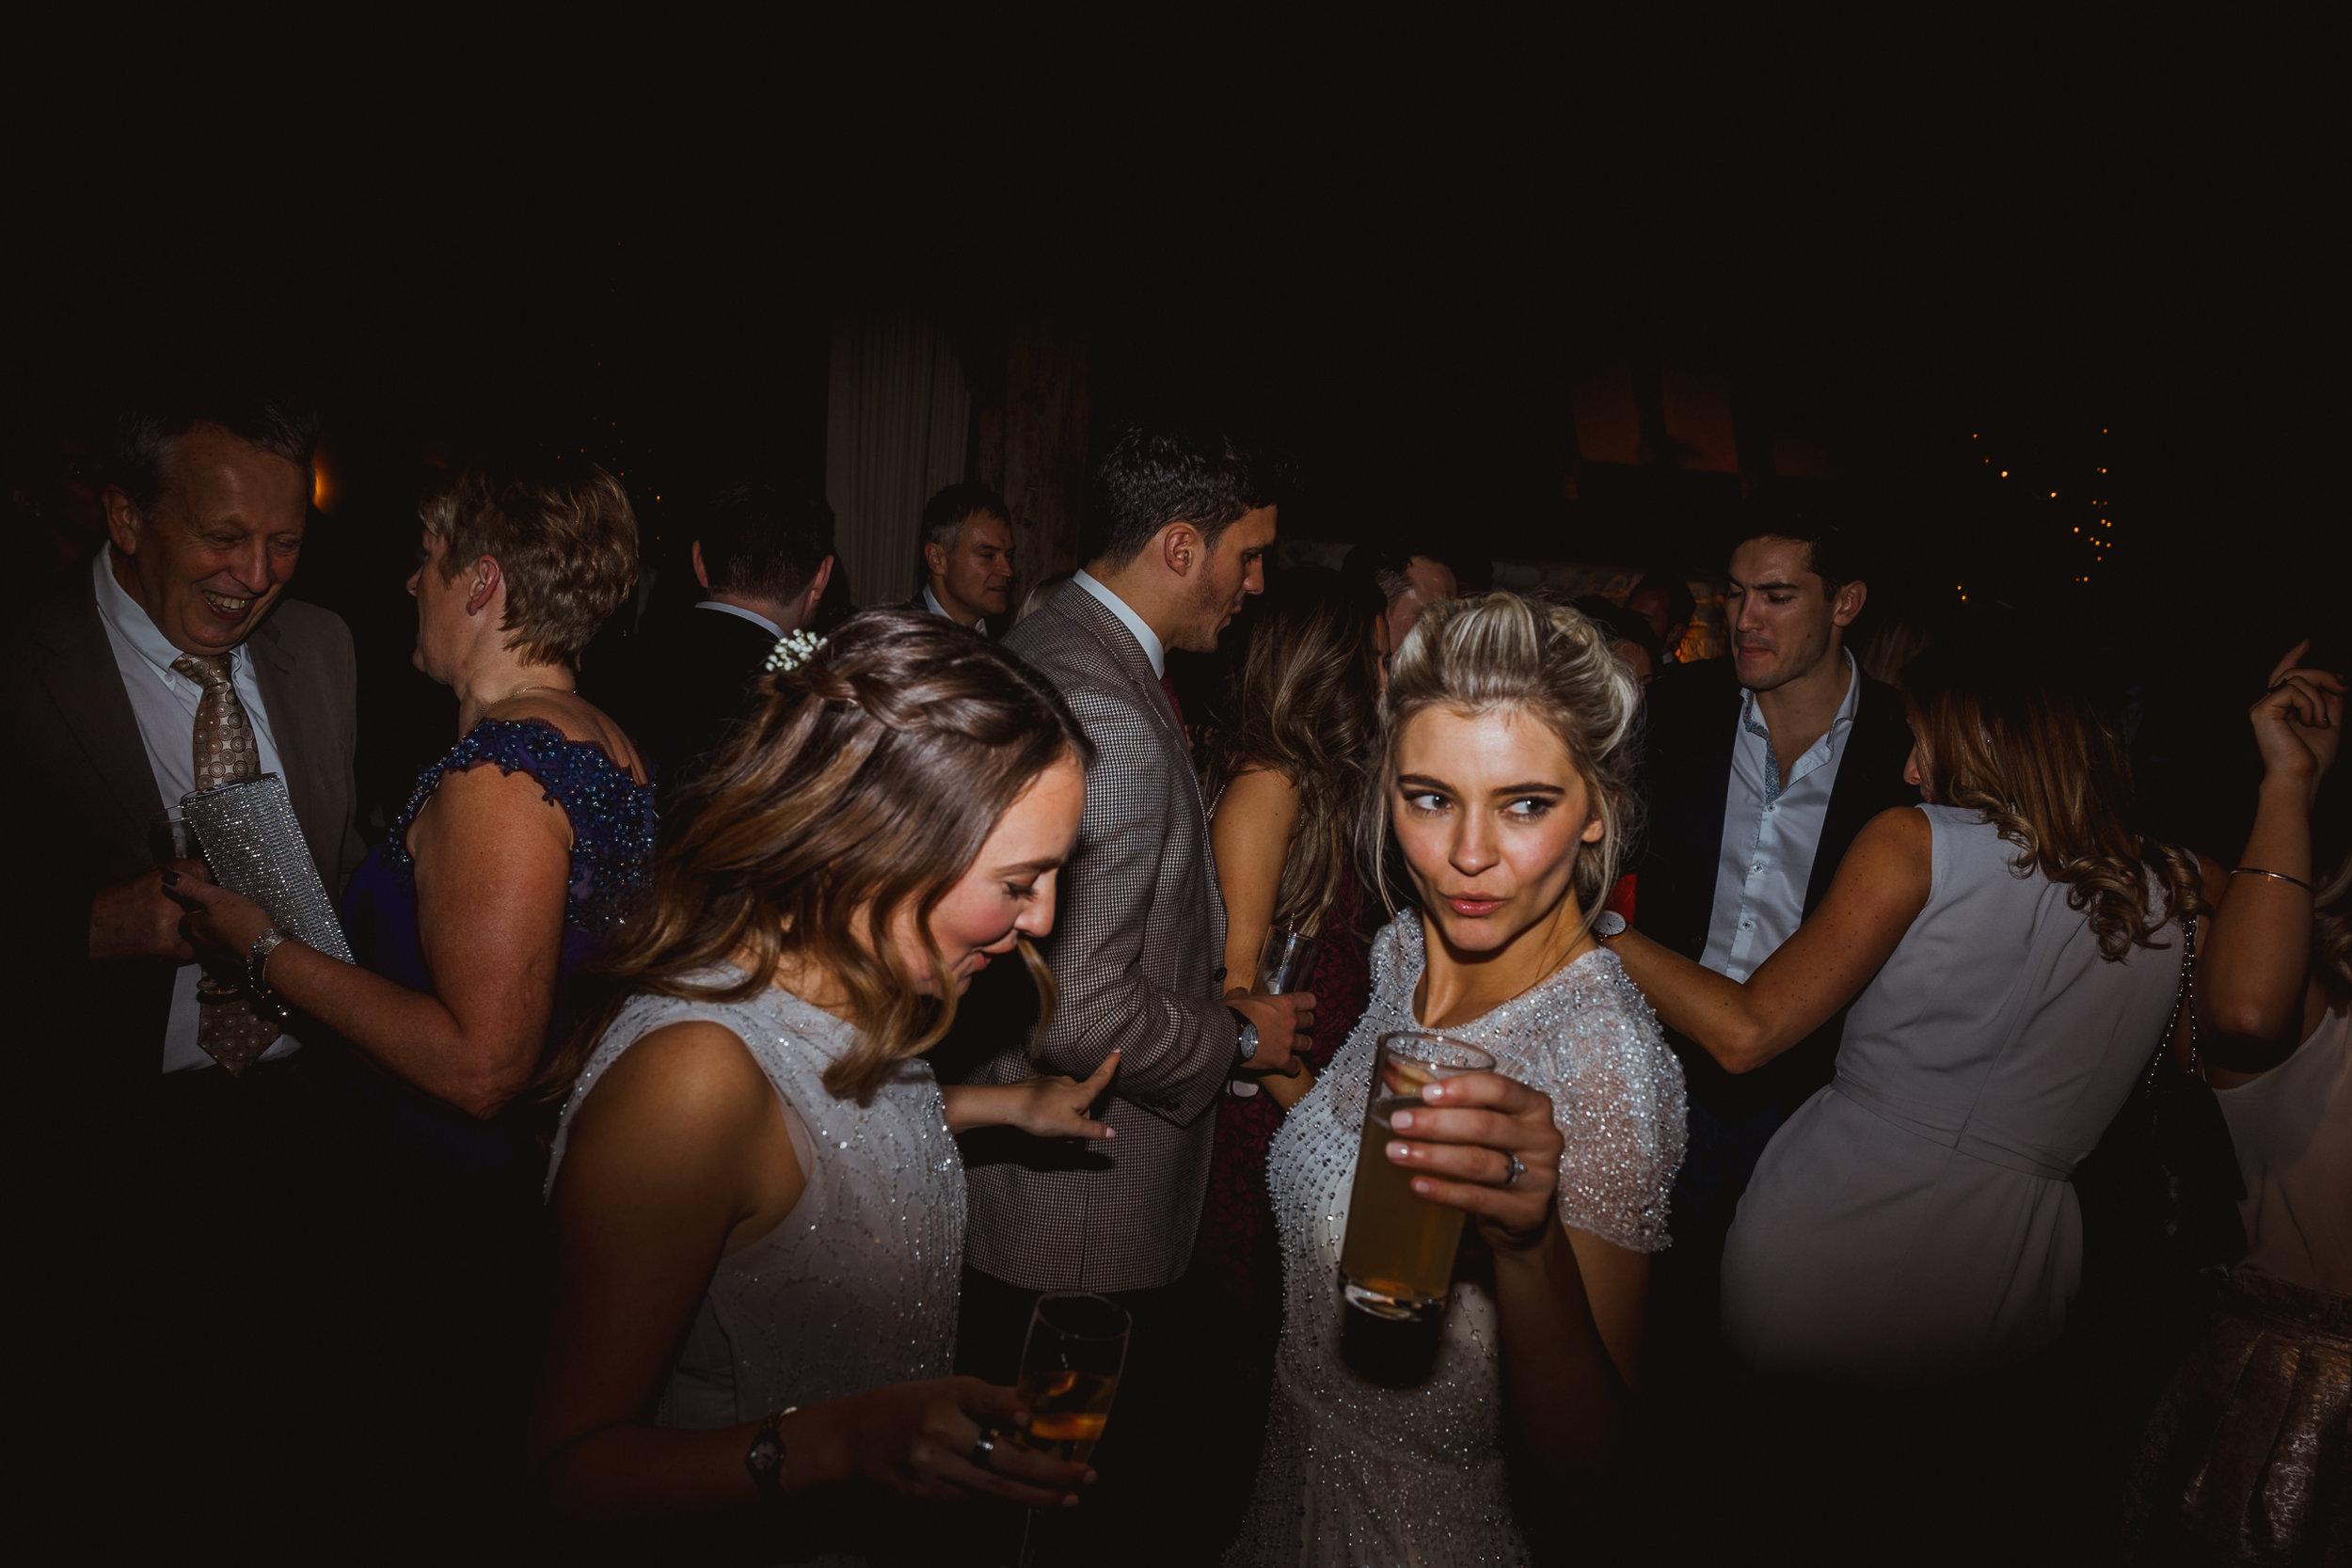 Jenny Packham dress Bury Court Barn Hampshire Wedding Photographer Gione da Silva_038.jpg